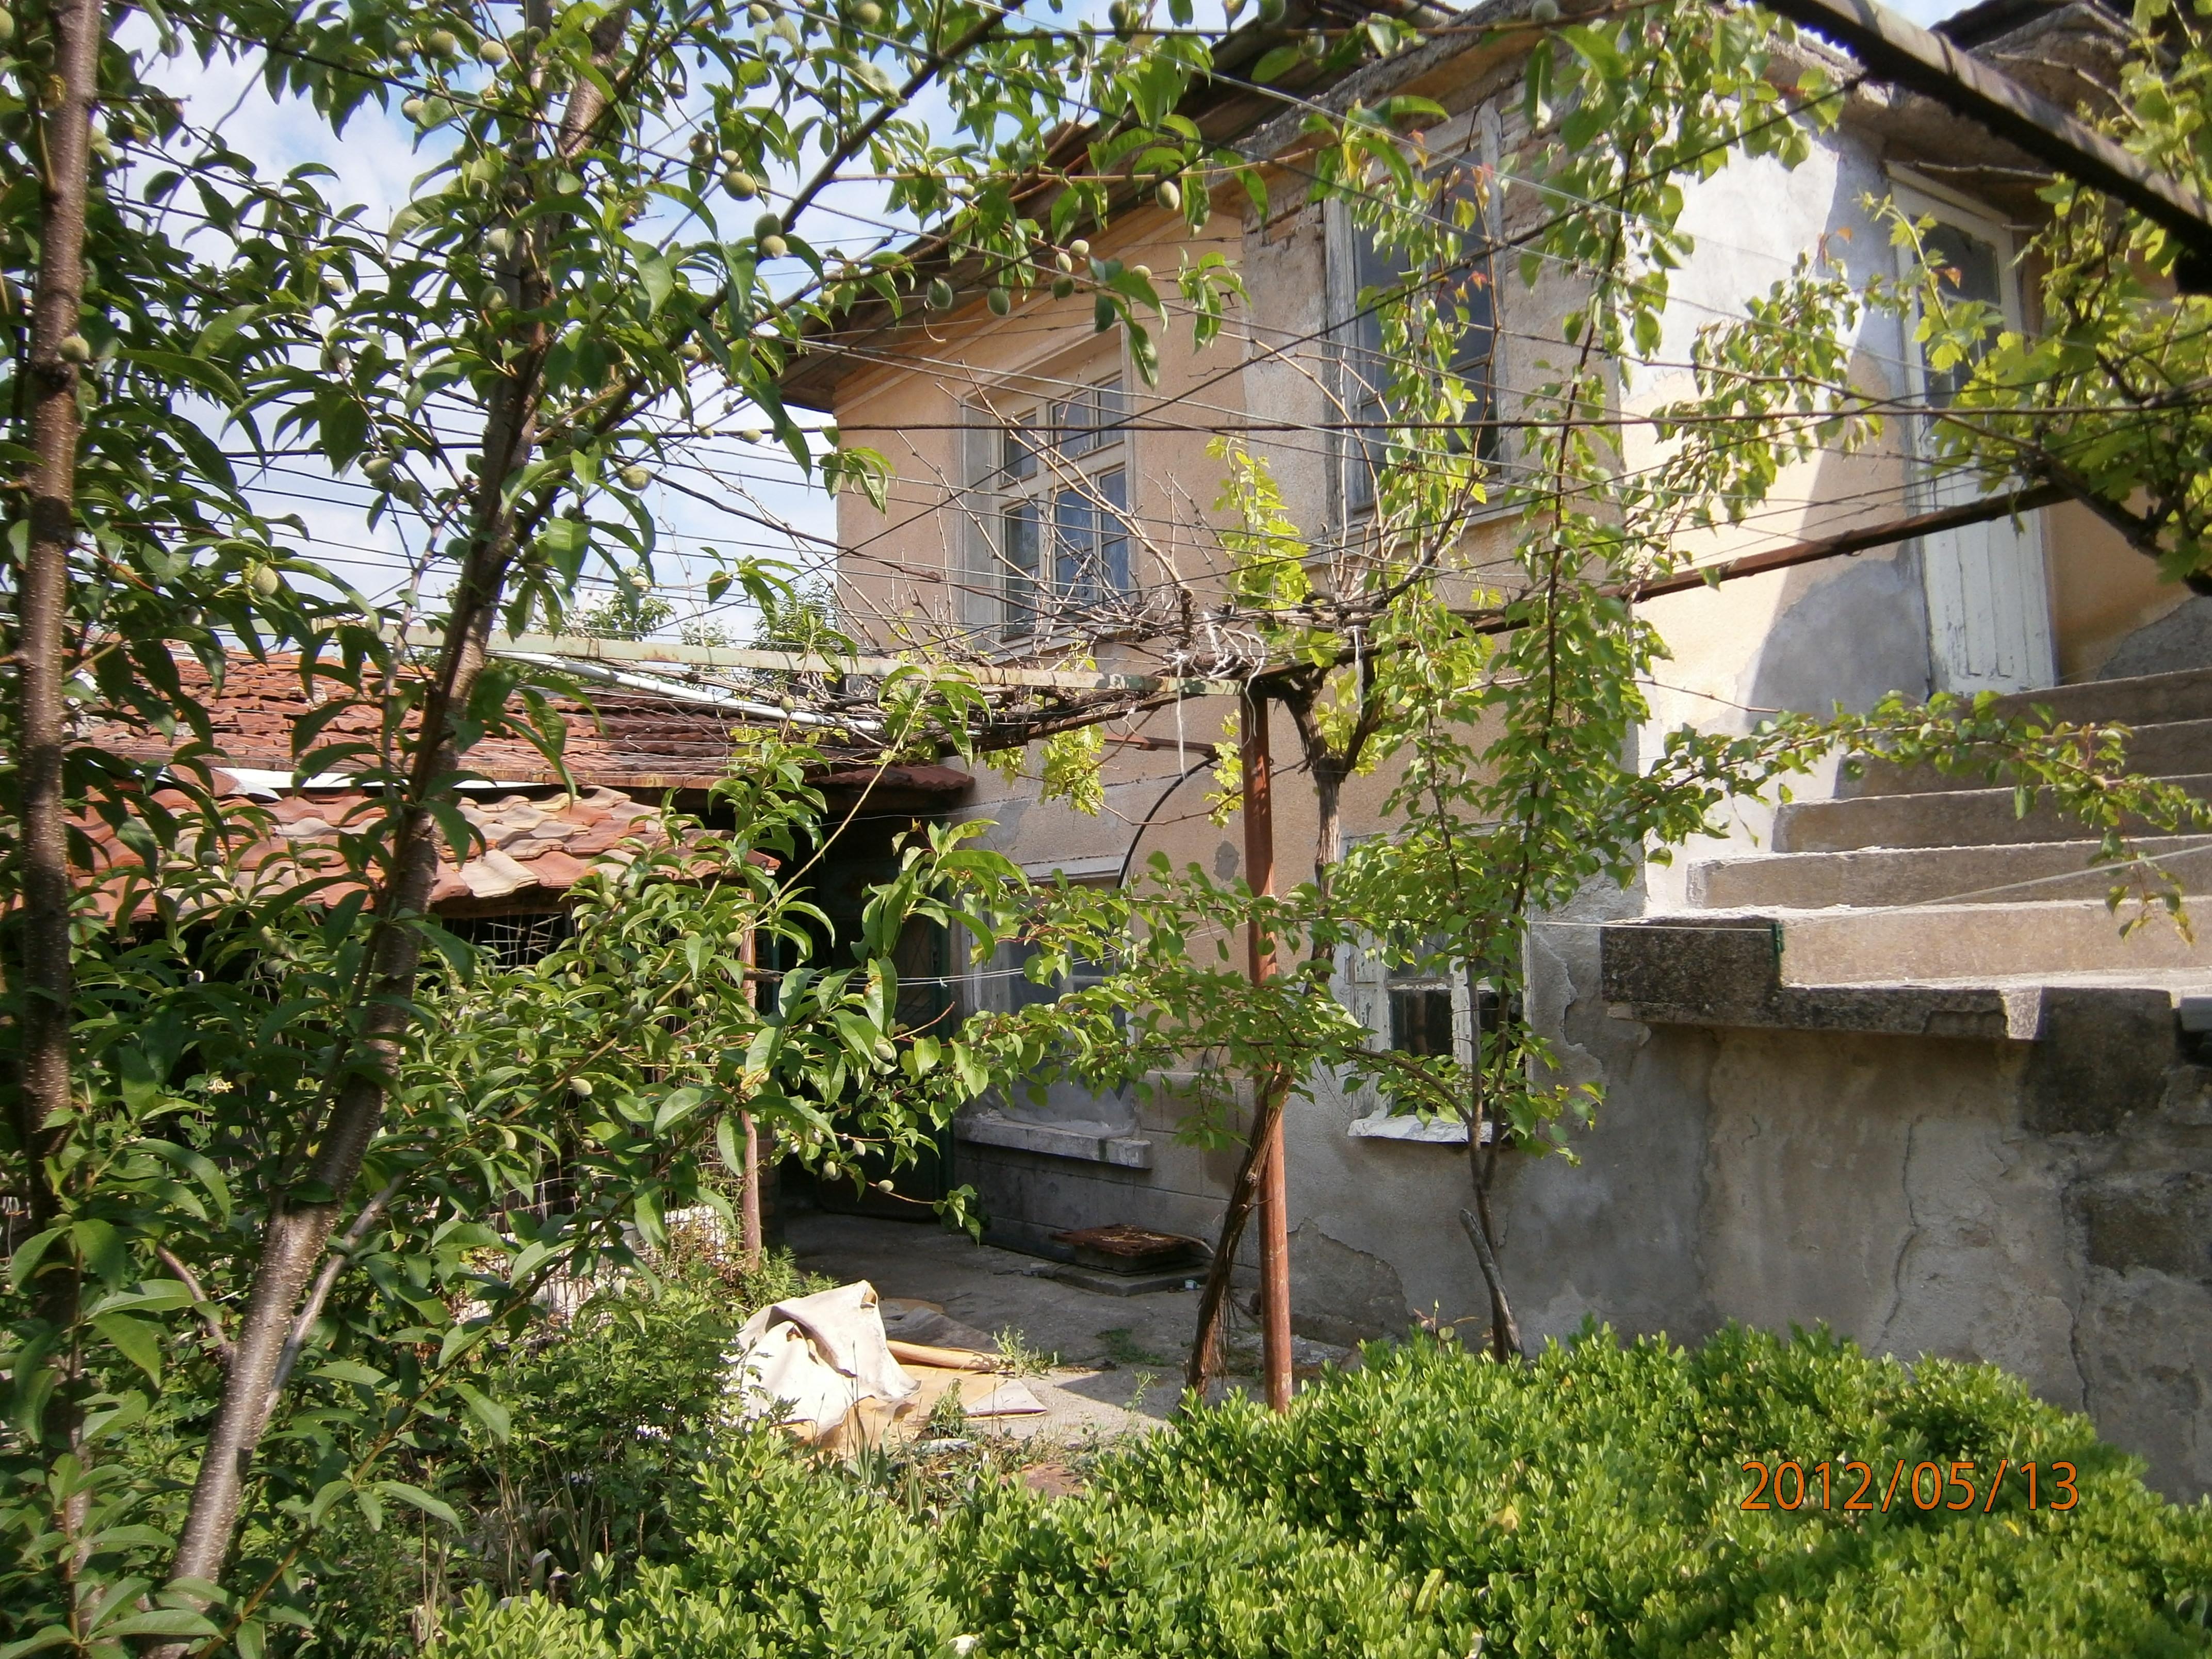 Immobilier dimitrievo stara zagora bulgarie maison rurale vendre pas ch - Maison pas chere a vendre ...